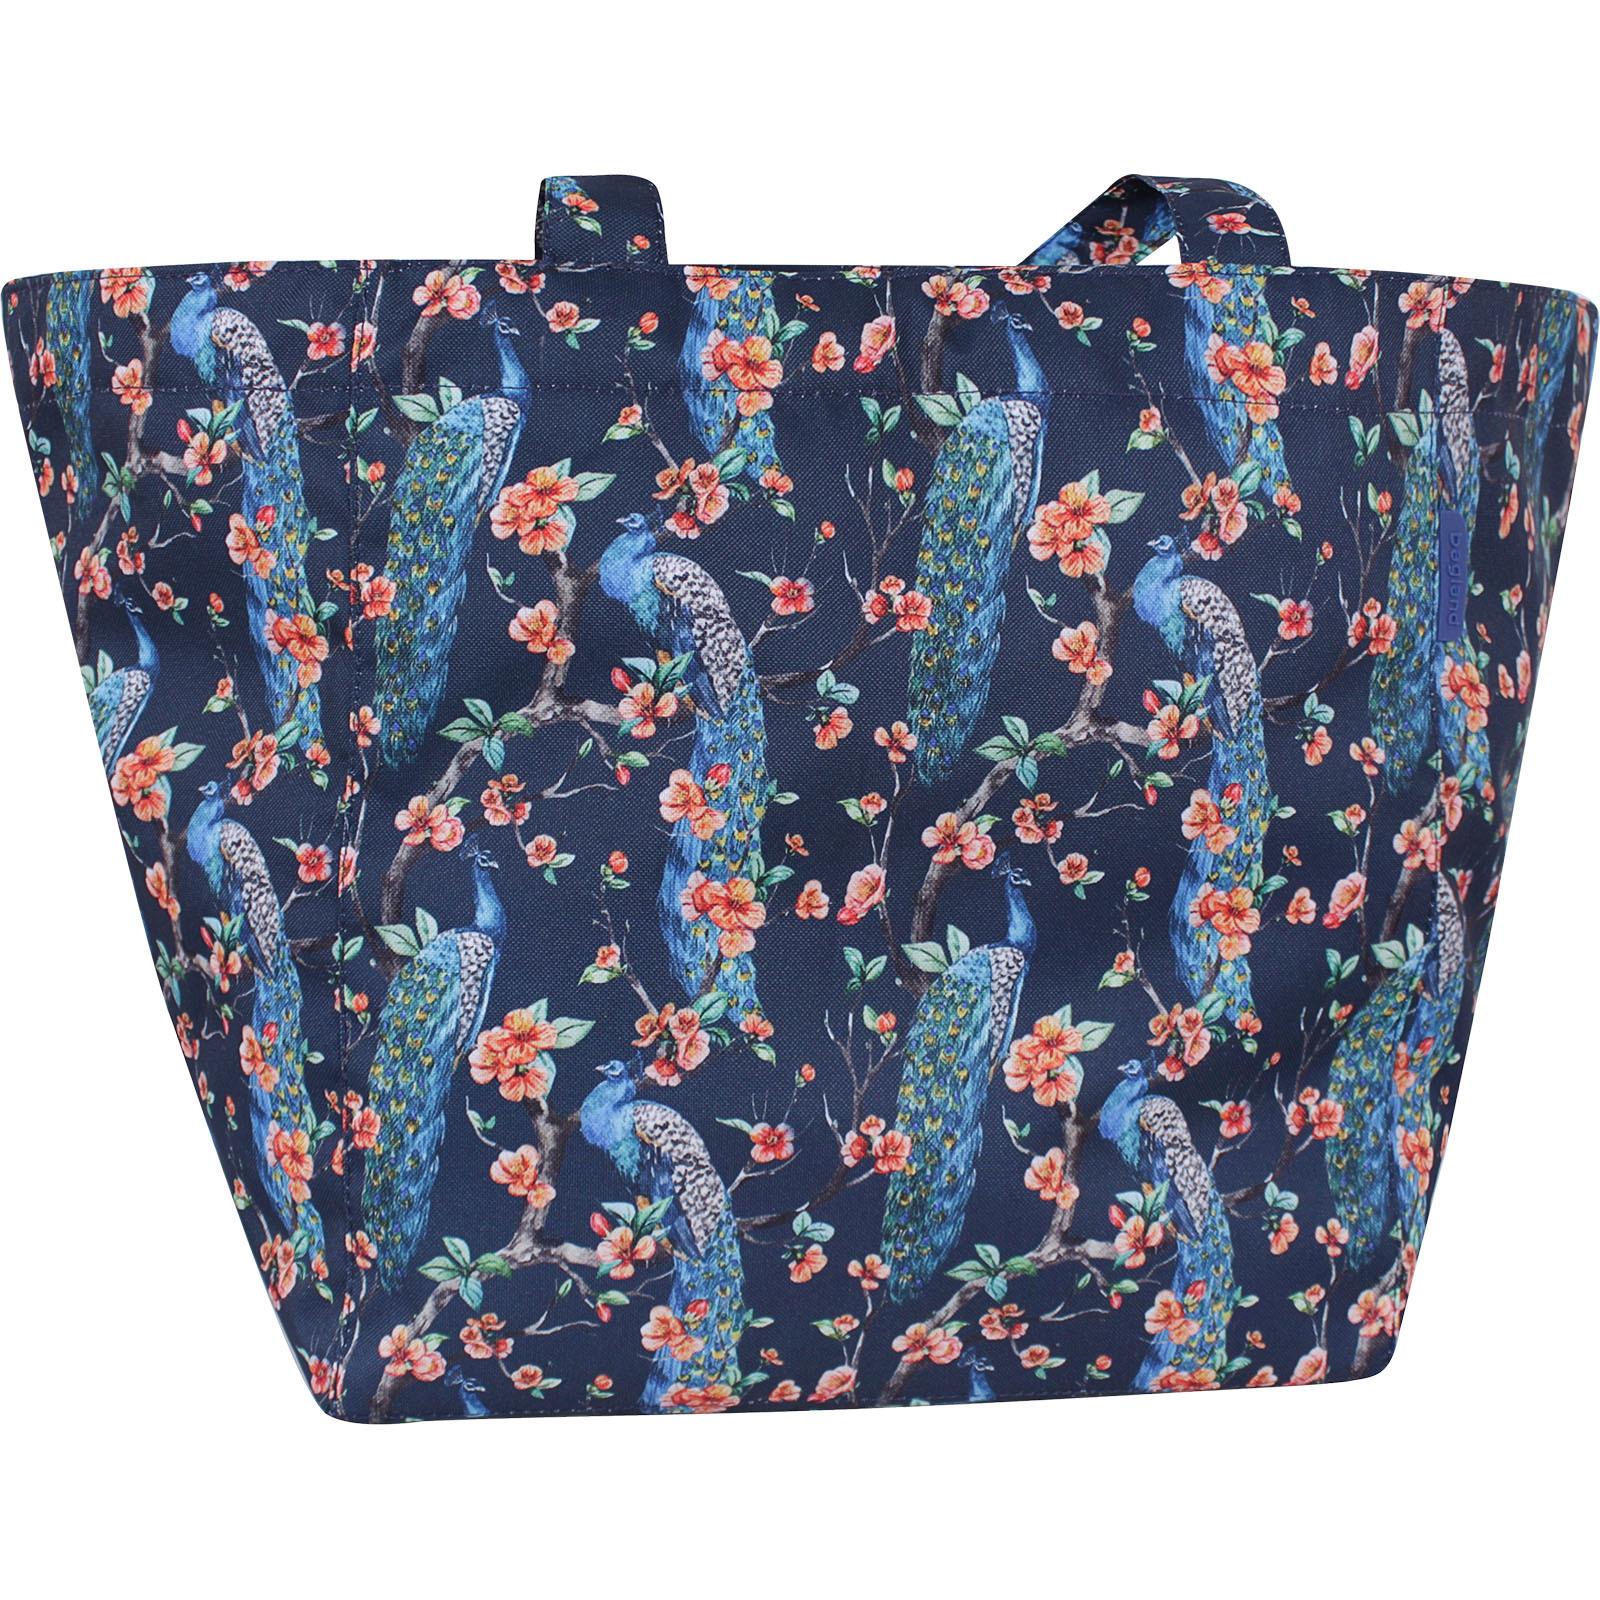 Дорожные сумки Сумка Bagland Elena 33 л. сублимация 787 (00732664) IMG_0783_суб.787_.JPG